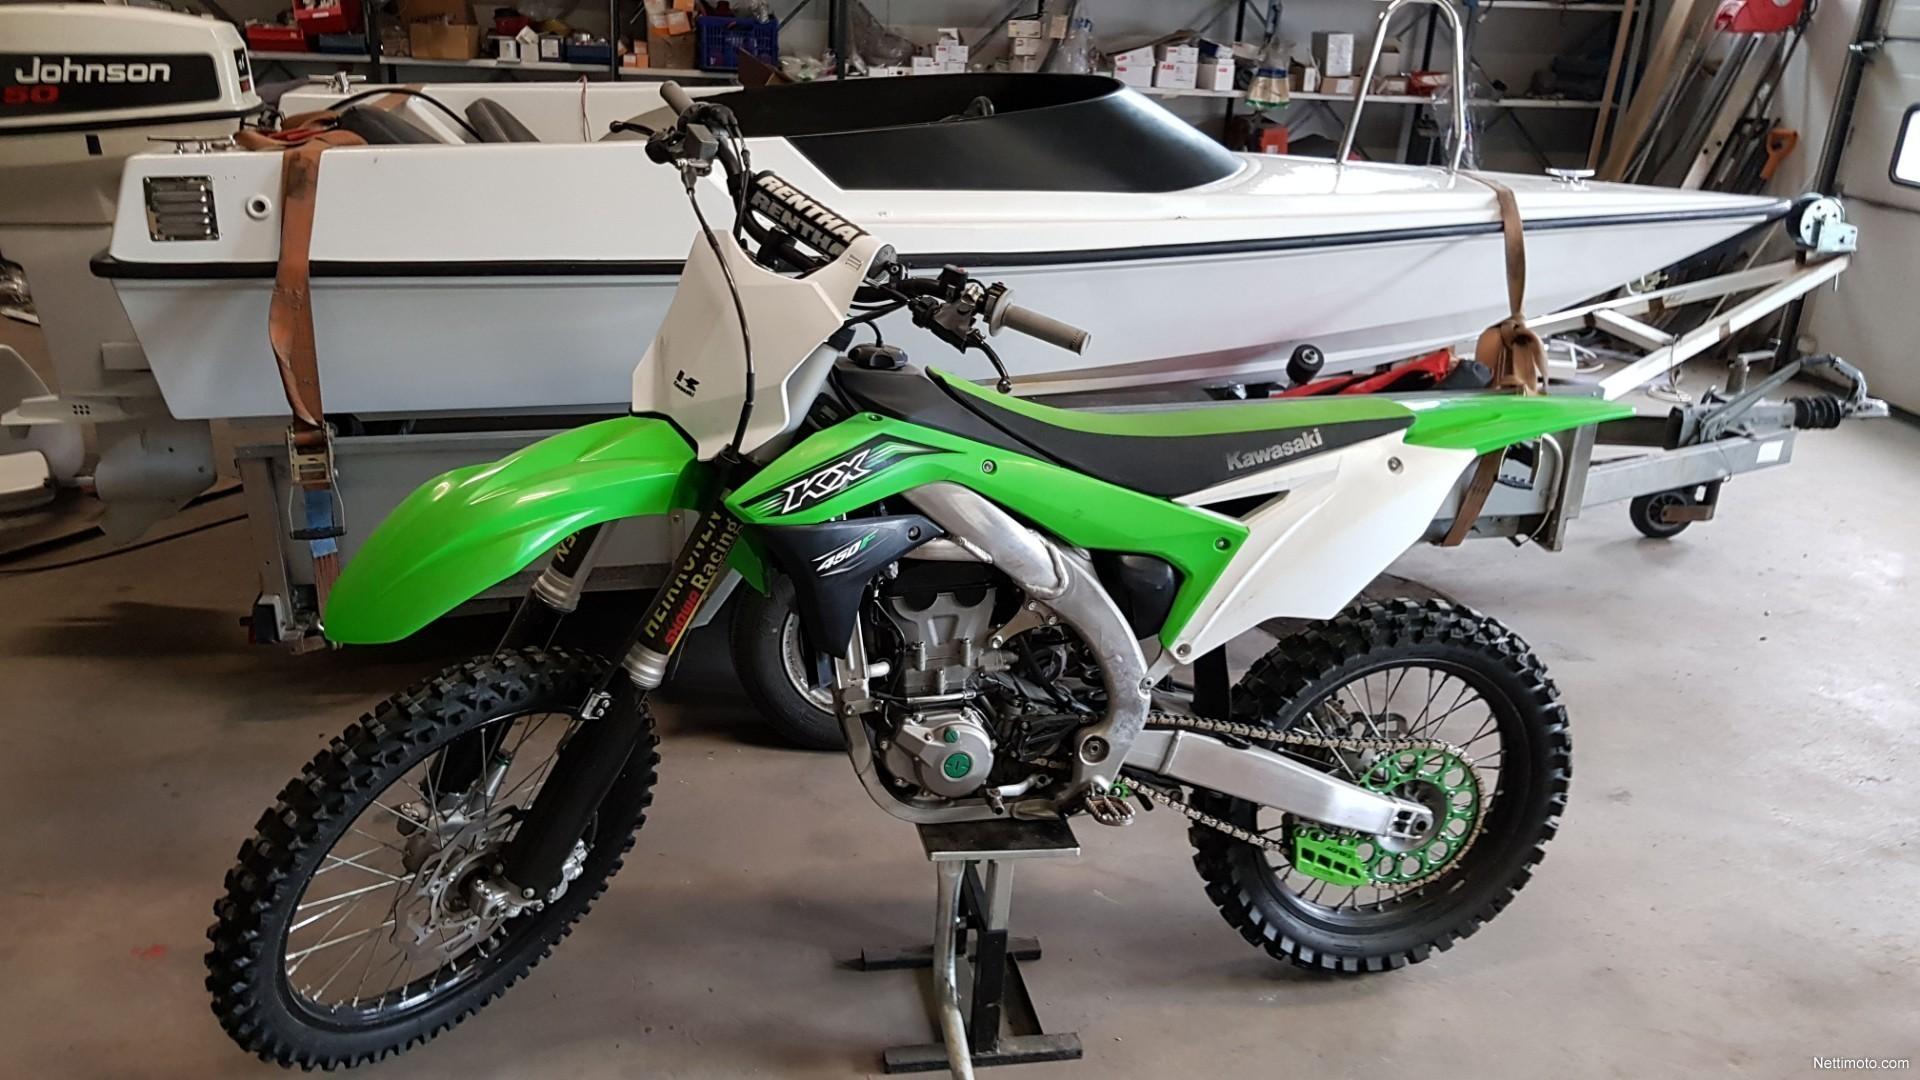 Kawasaki KX 450 F 450 cm³ 2018 - Konnevesi - Motorcycle